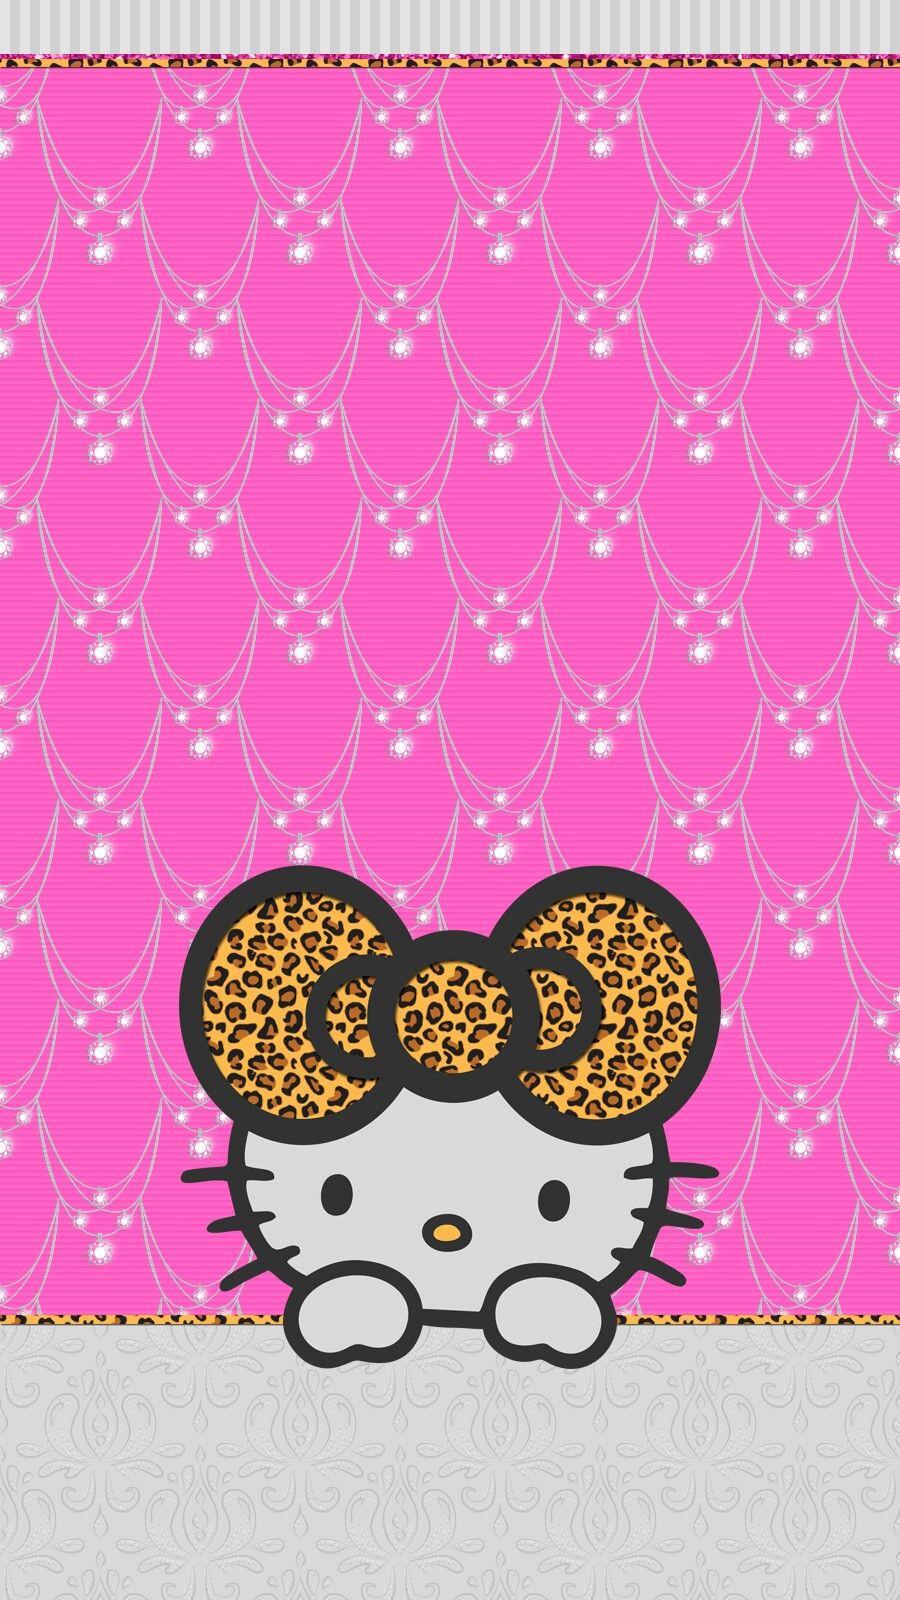 Amazing Wallpaper Hello Kitty Diamond - 3d0051dc1474007406d632b31a8e037c  Photograph_233646.jpg